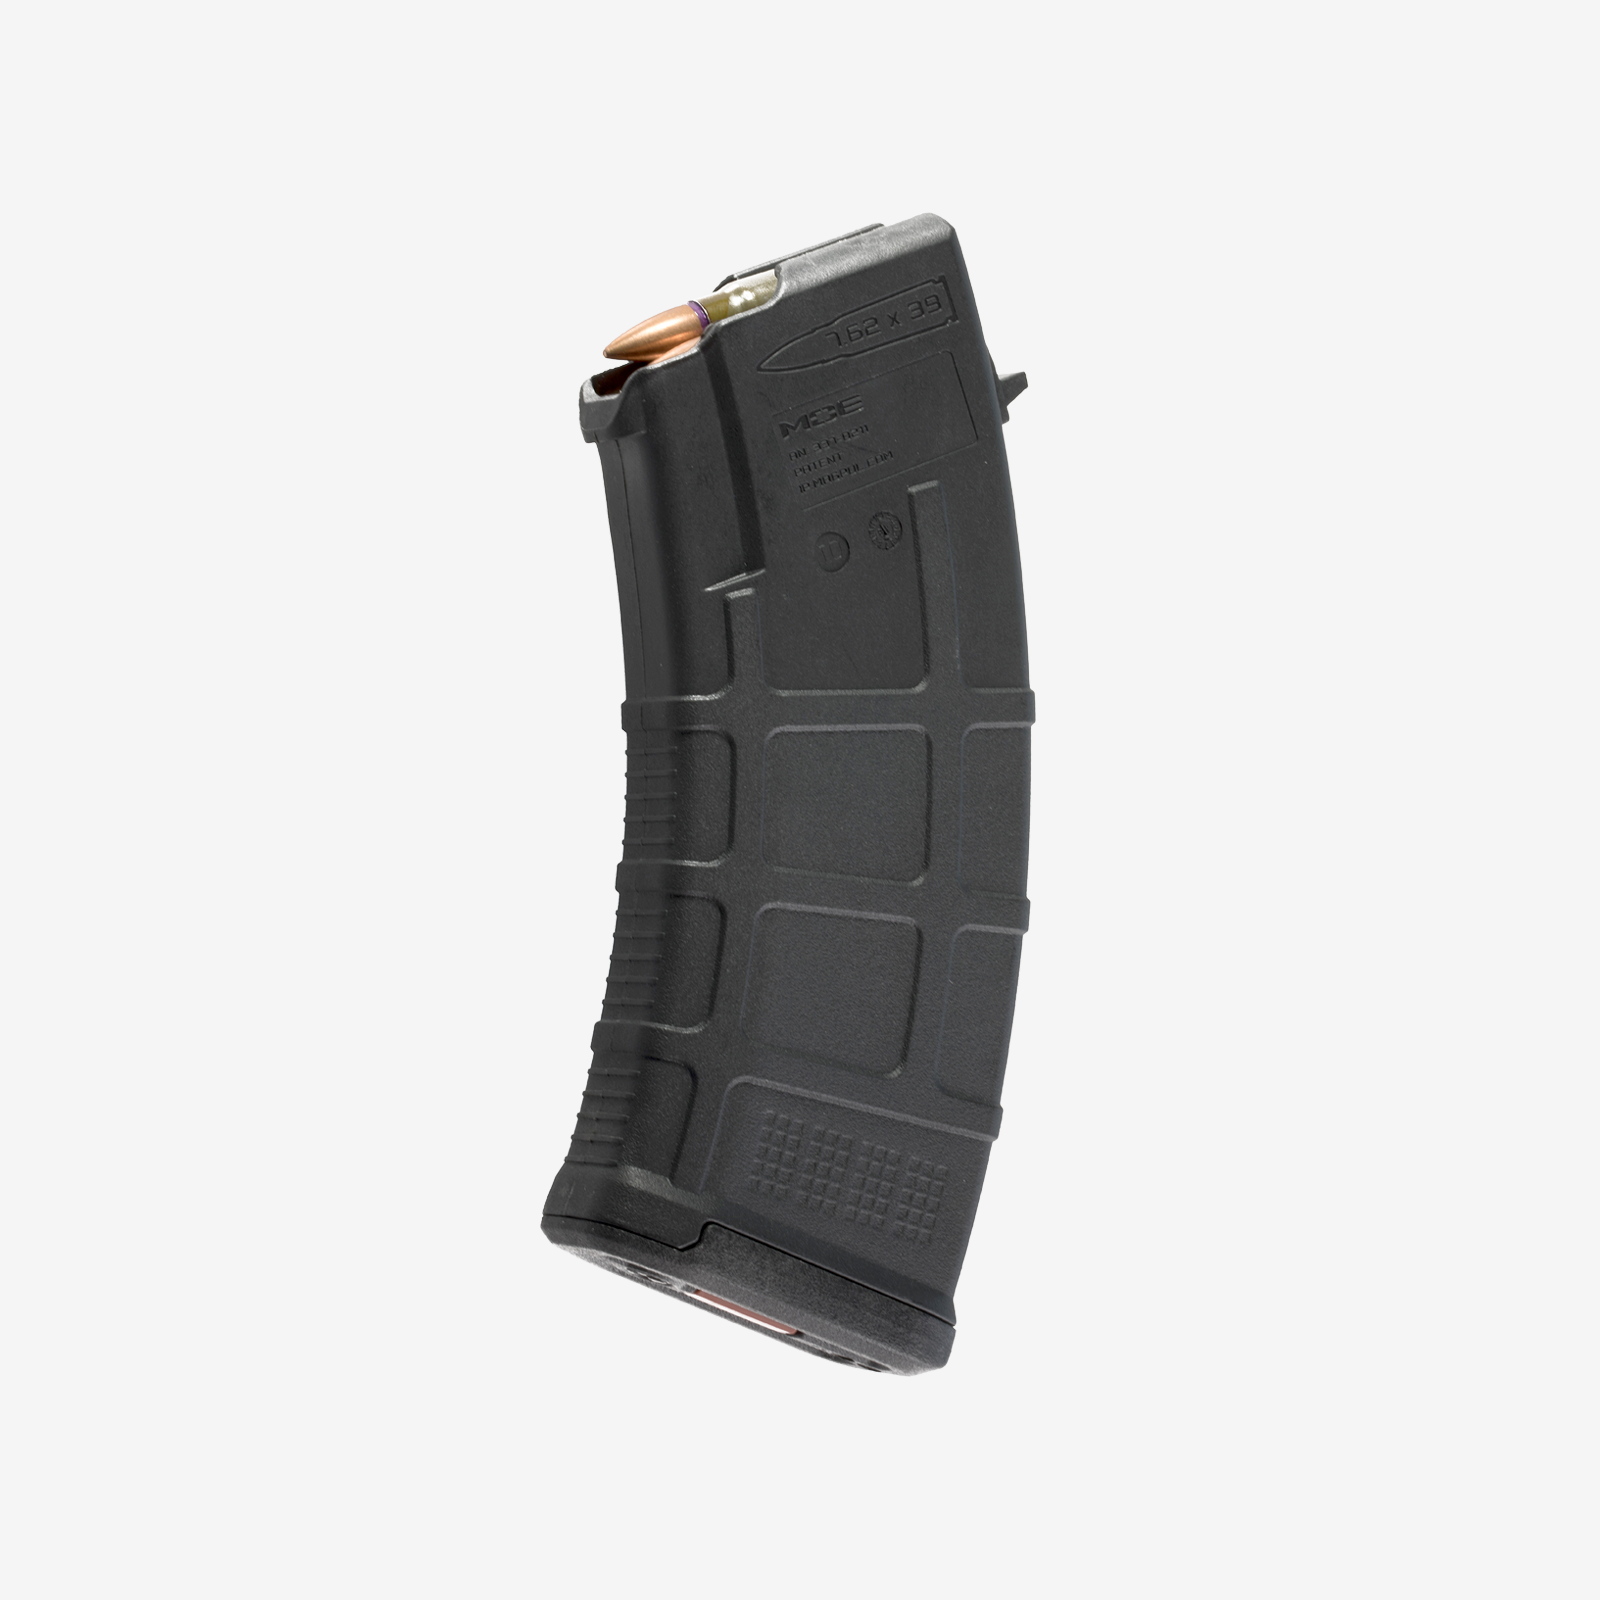 Магазин PMAG® 20 AK/AKM MOE®, 7,62x39